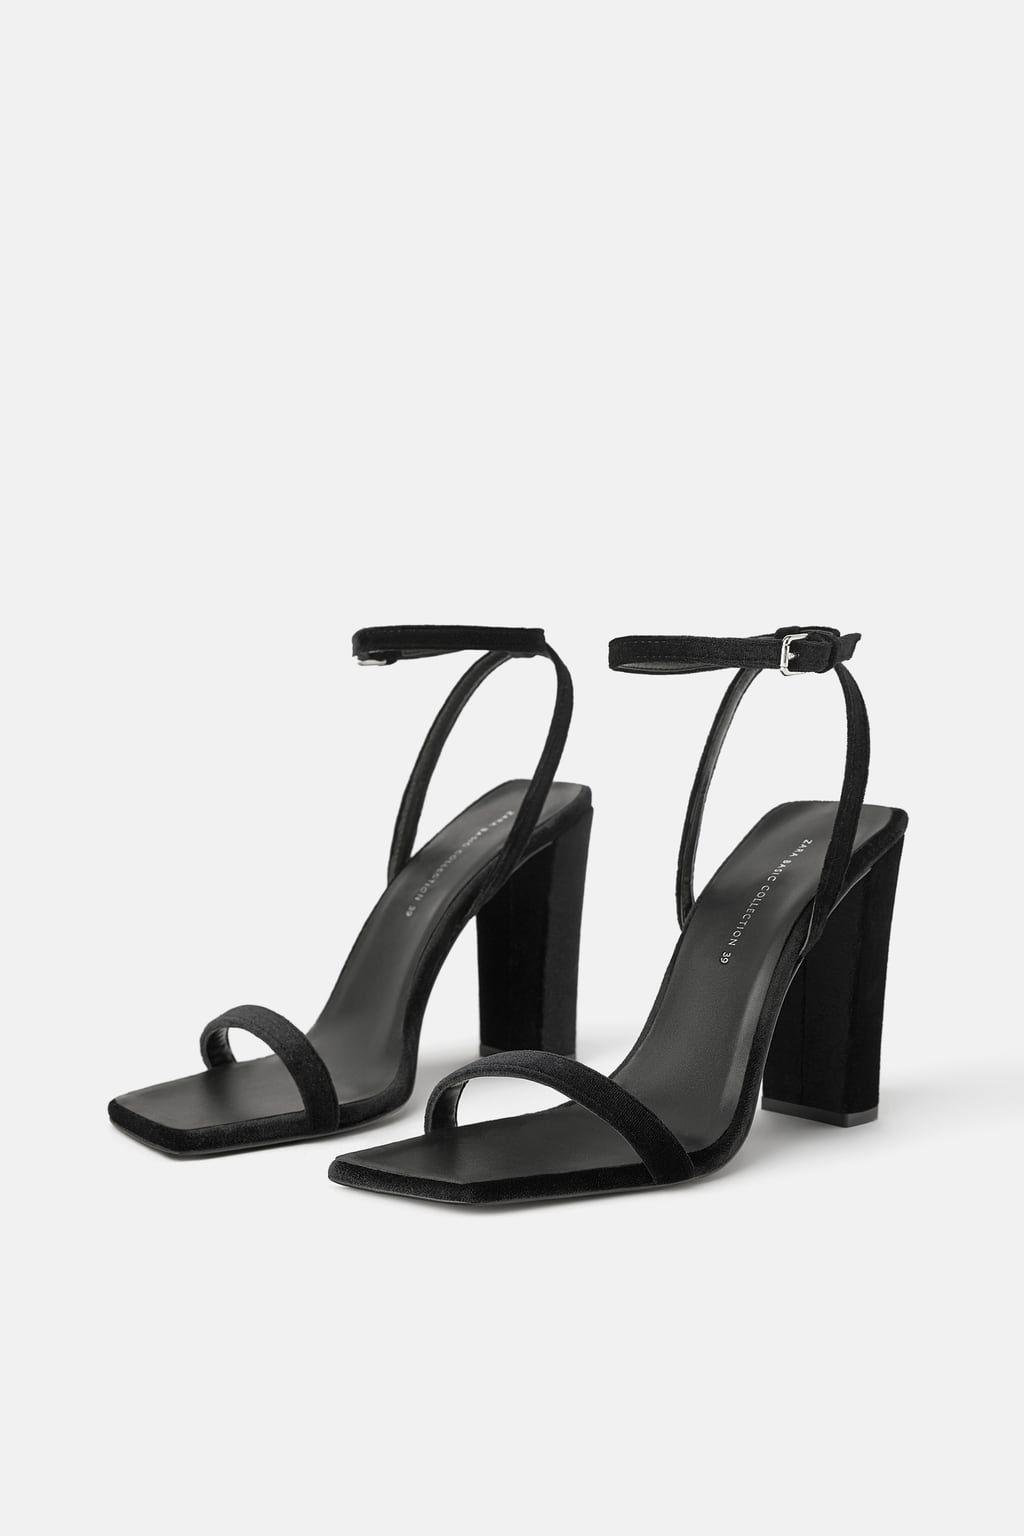 c88e67b2808 Velvet wide heeled sandals in 2019 | .fashion. | Heels, Shoes, Sandals